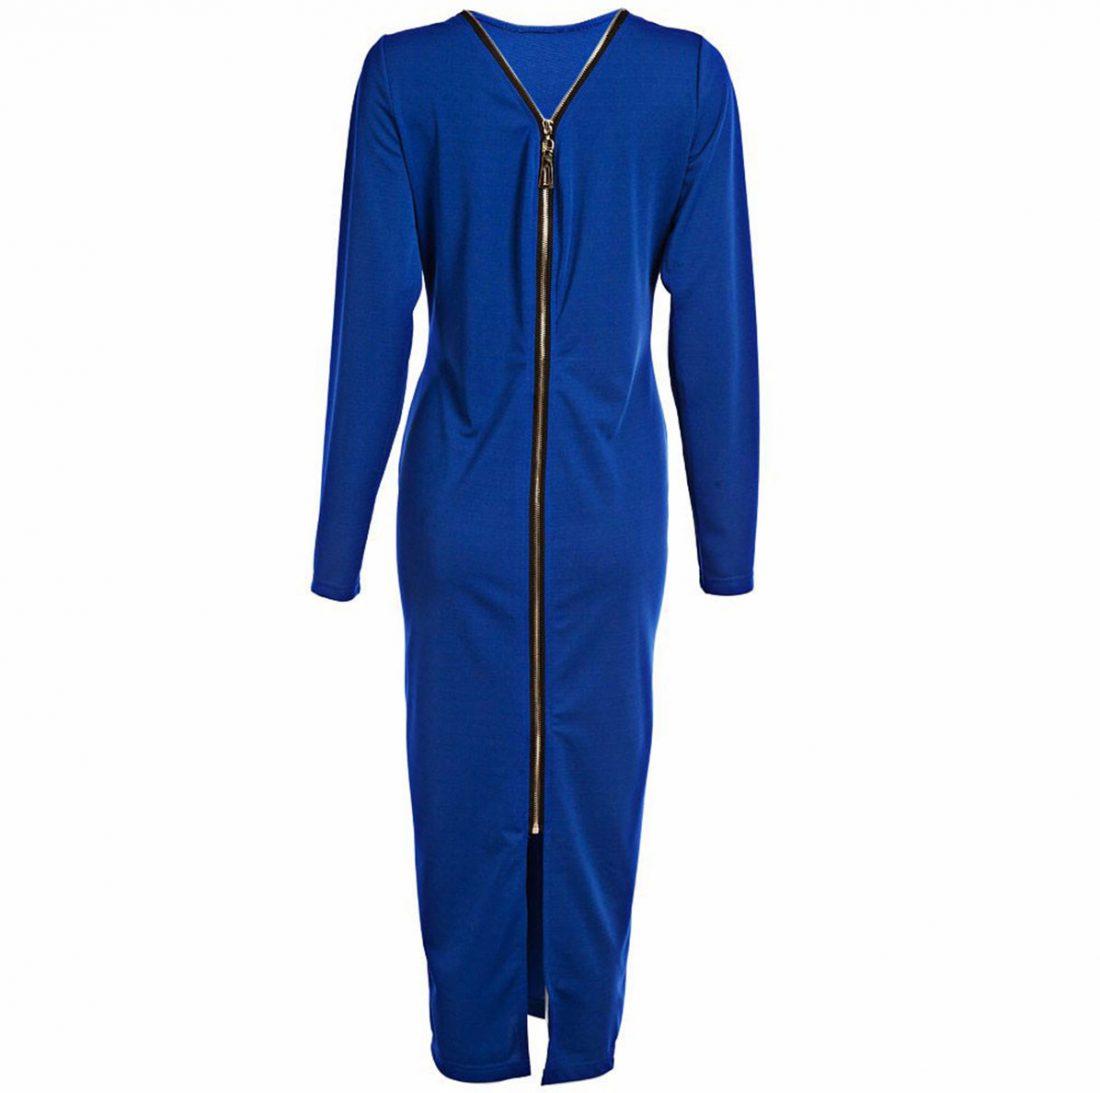 M0185 blue8 Office Evening Dresses maureens.com boutique